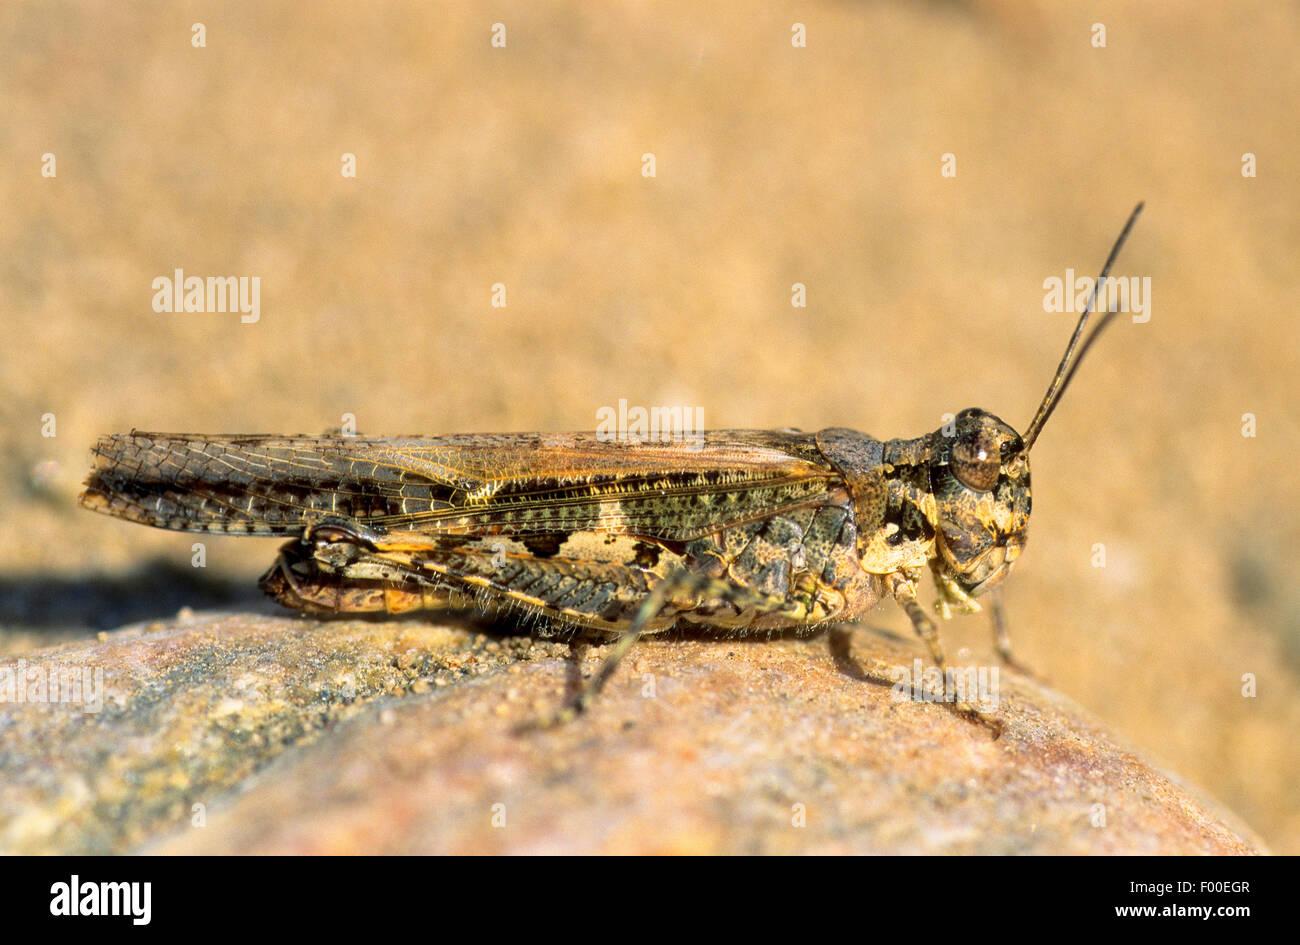 Slender Burrowing Grasshopper, Slender Digging Grasshopper, Slender Red-winged Grasshopper, Band-winged Grasshopper - Stock Image